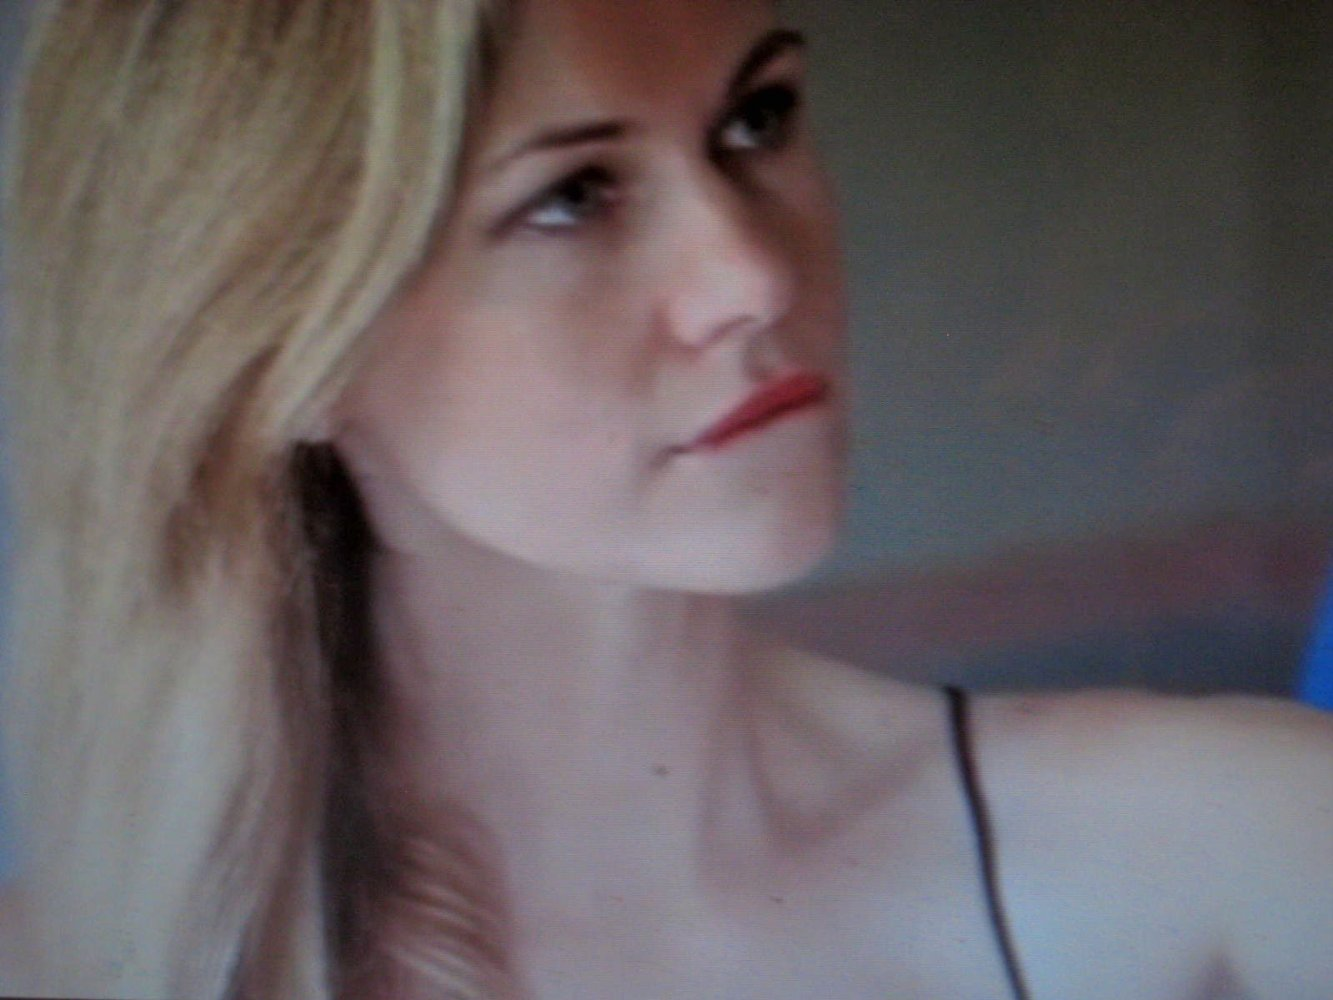 Traci Dinwiddie,Saki Seto (b. 1985) XXX videos Rosita Capuyon (b. ?),Xia Vigor (b. 2009)